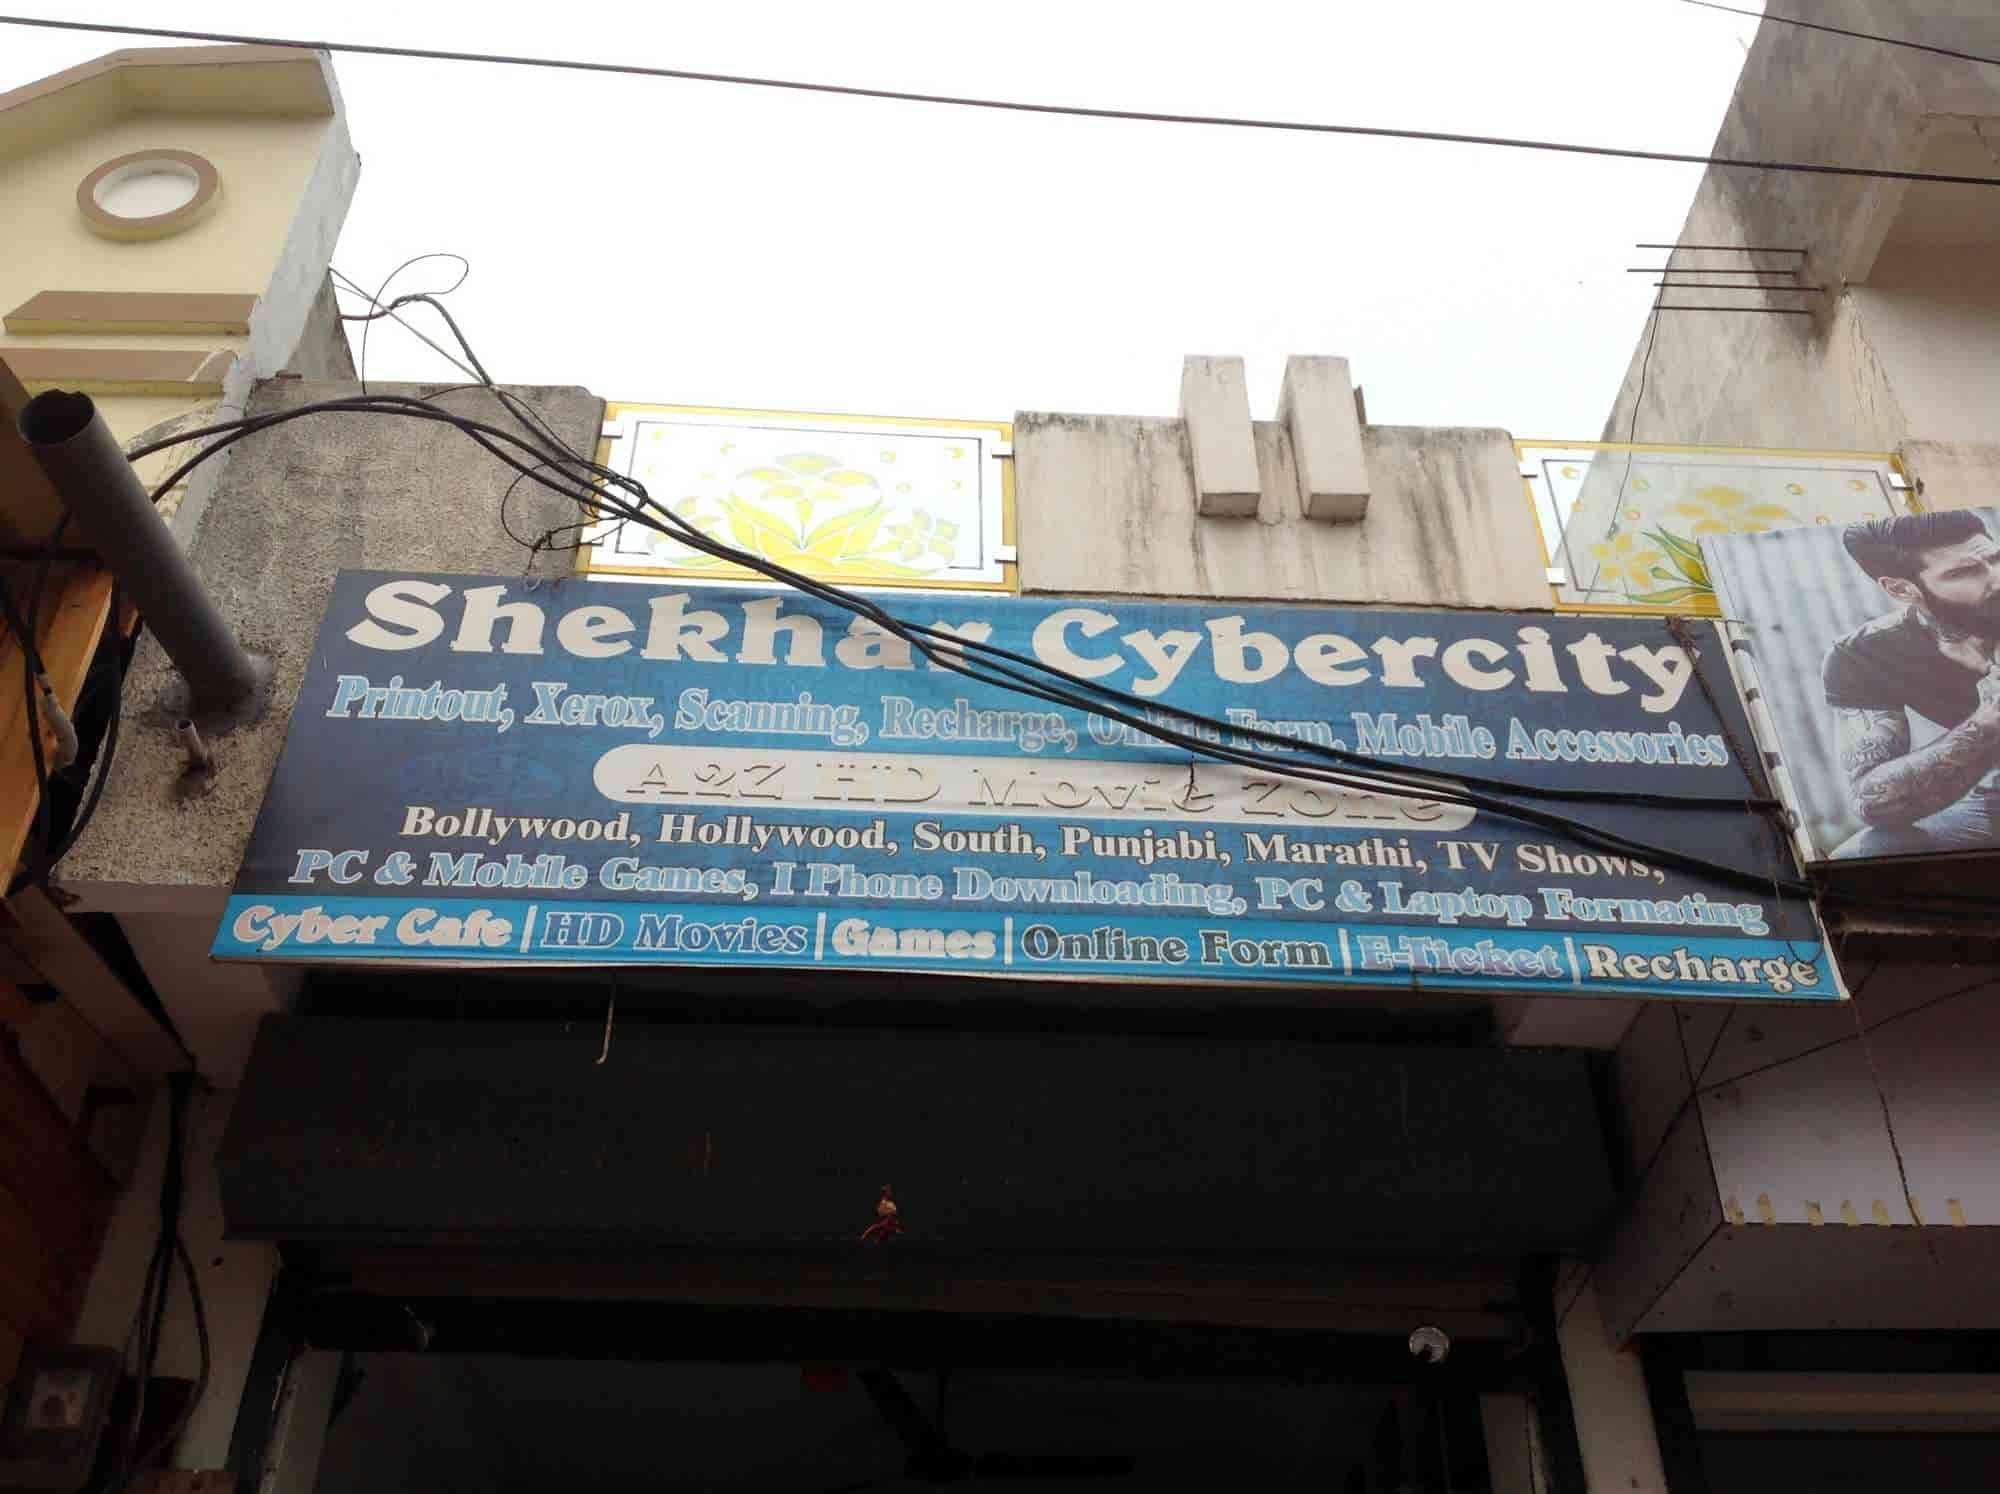 Shekhar Cybercity Photos, Gumasta Nagar, Indore- Pictures & Images ...